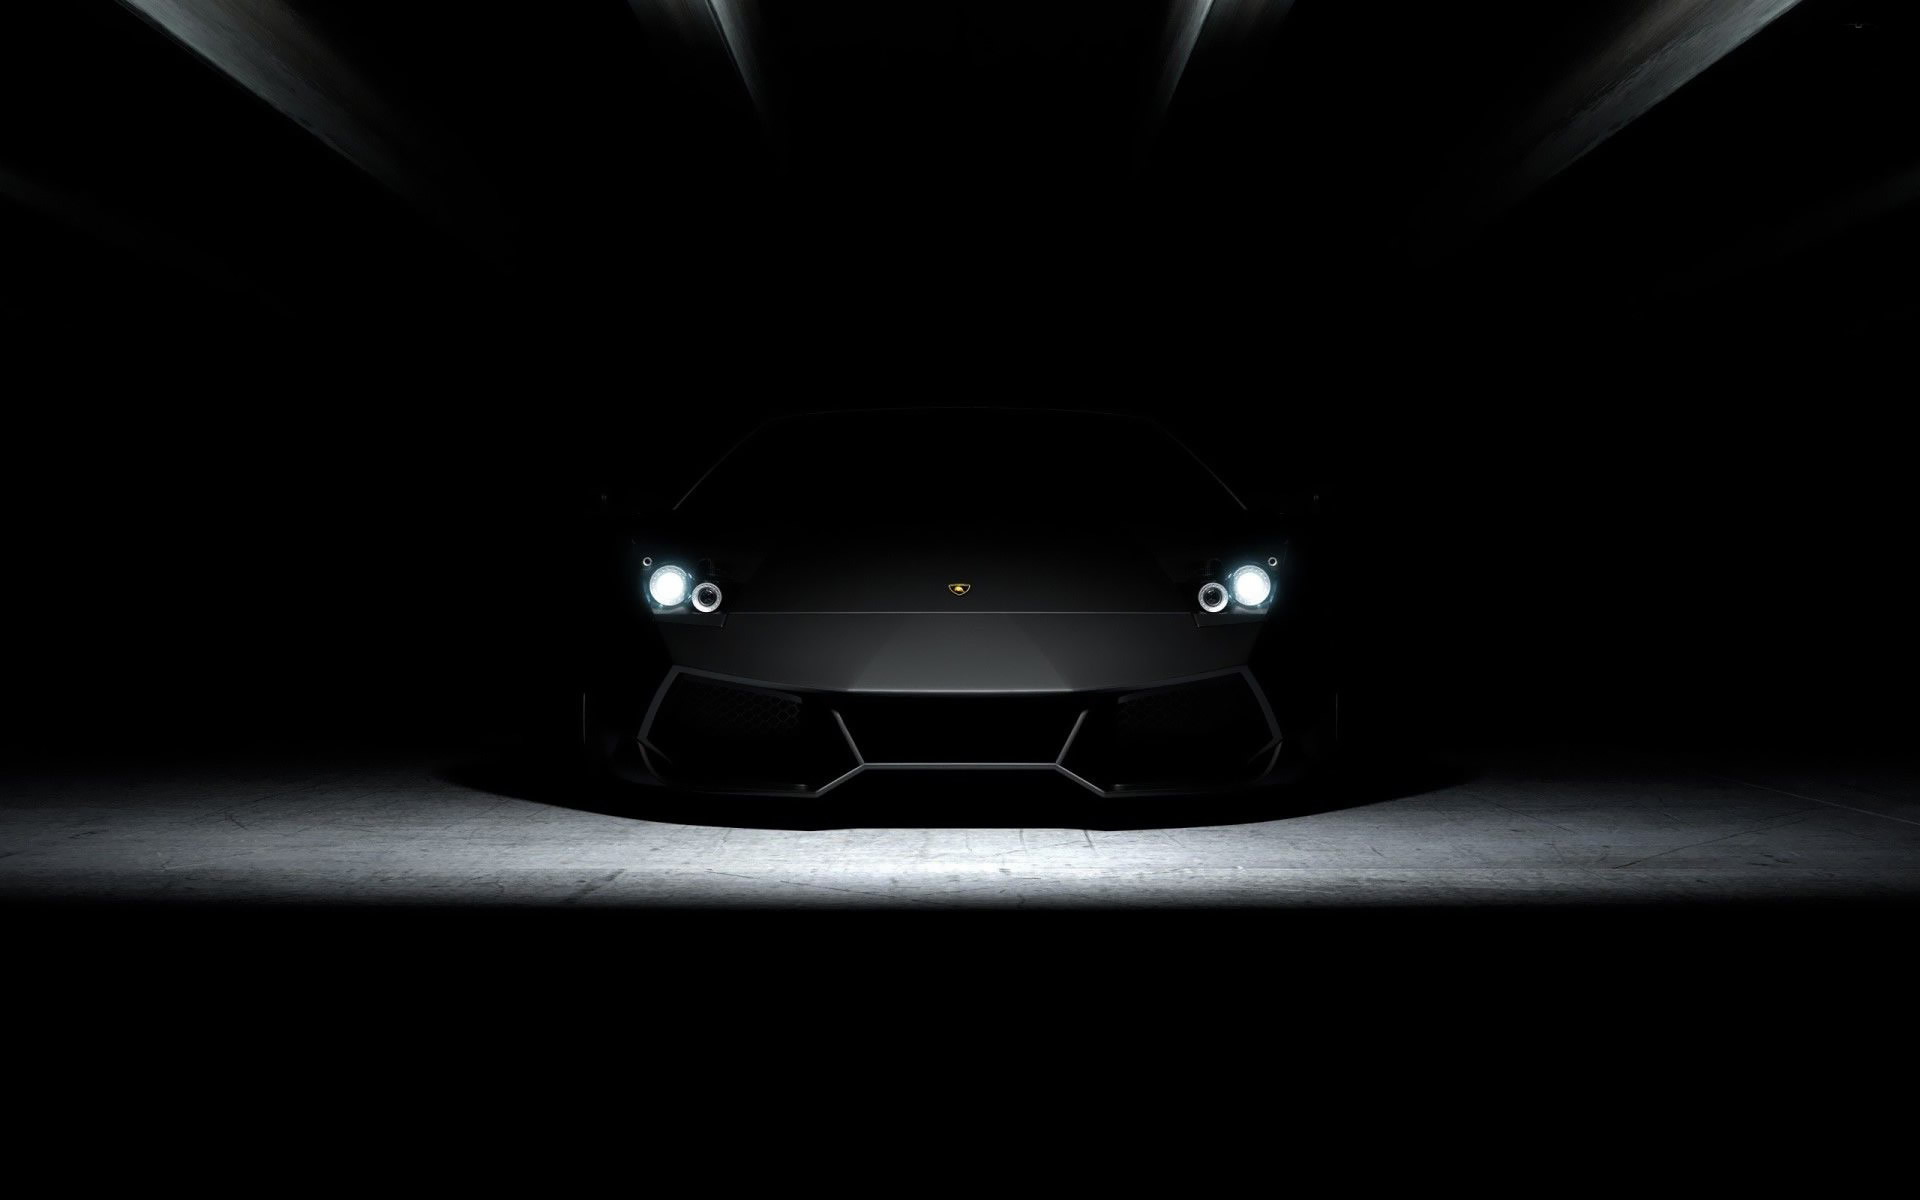 Black Ferrari Wallpaper Desktop Background #3rQ